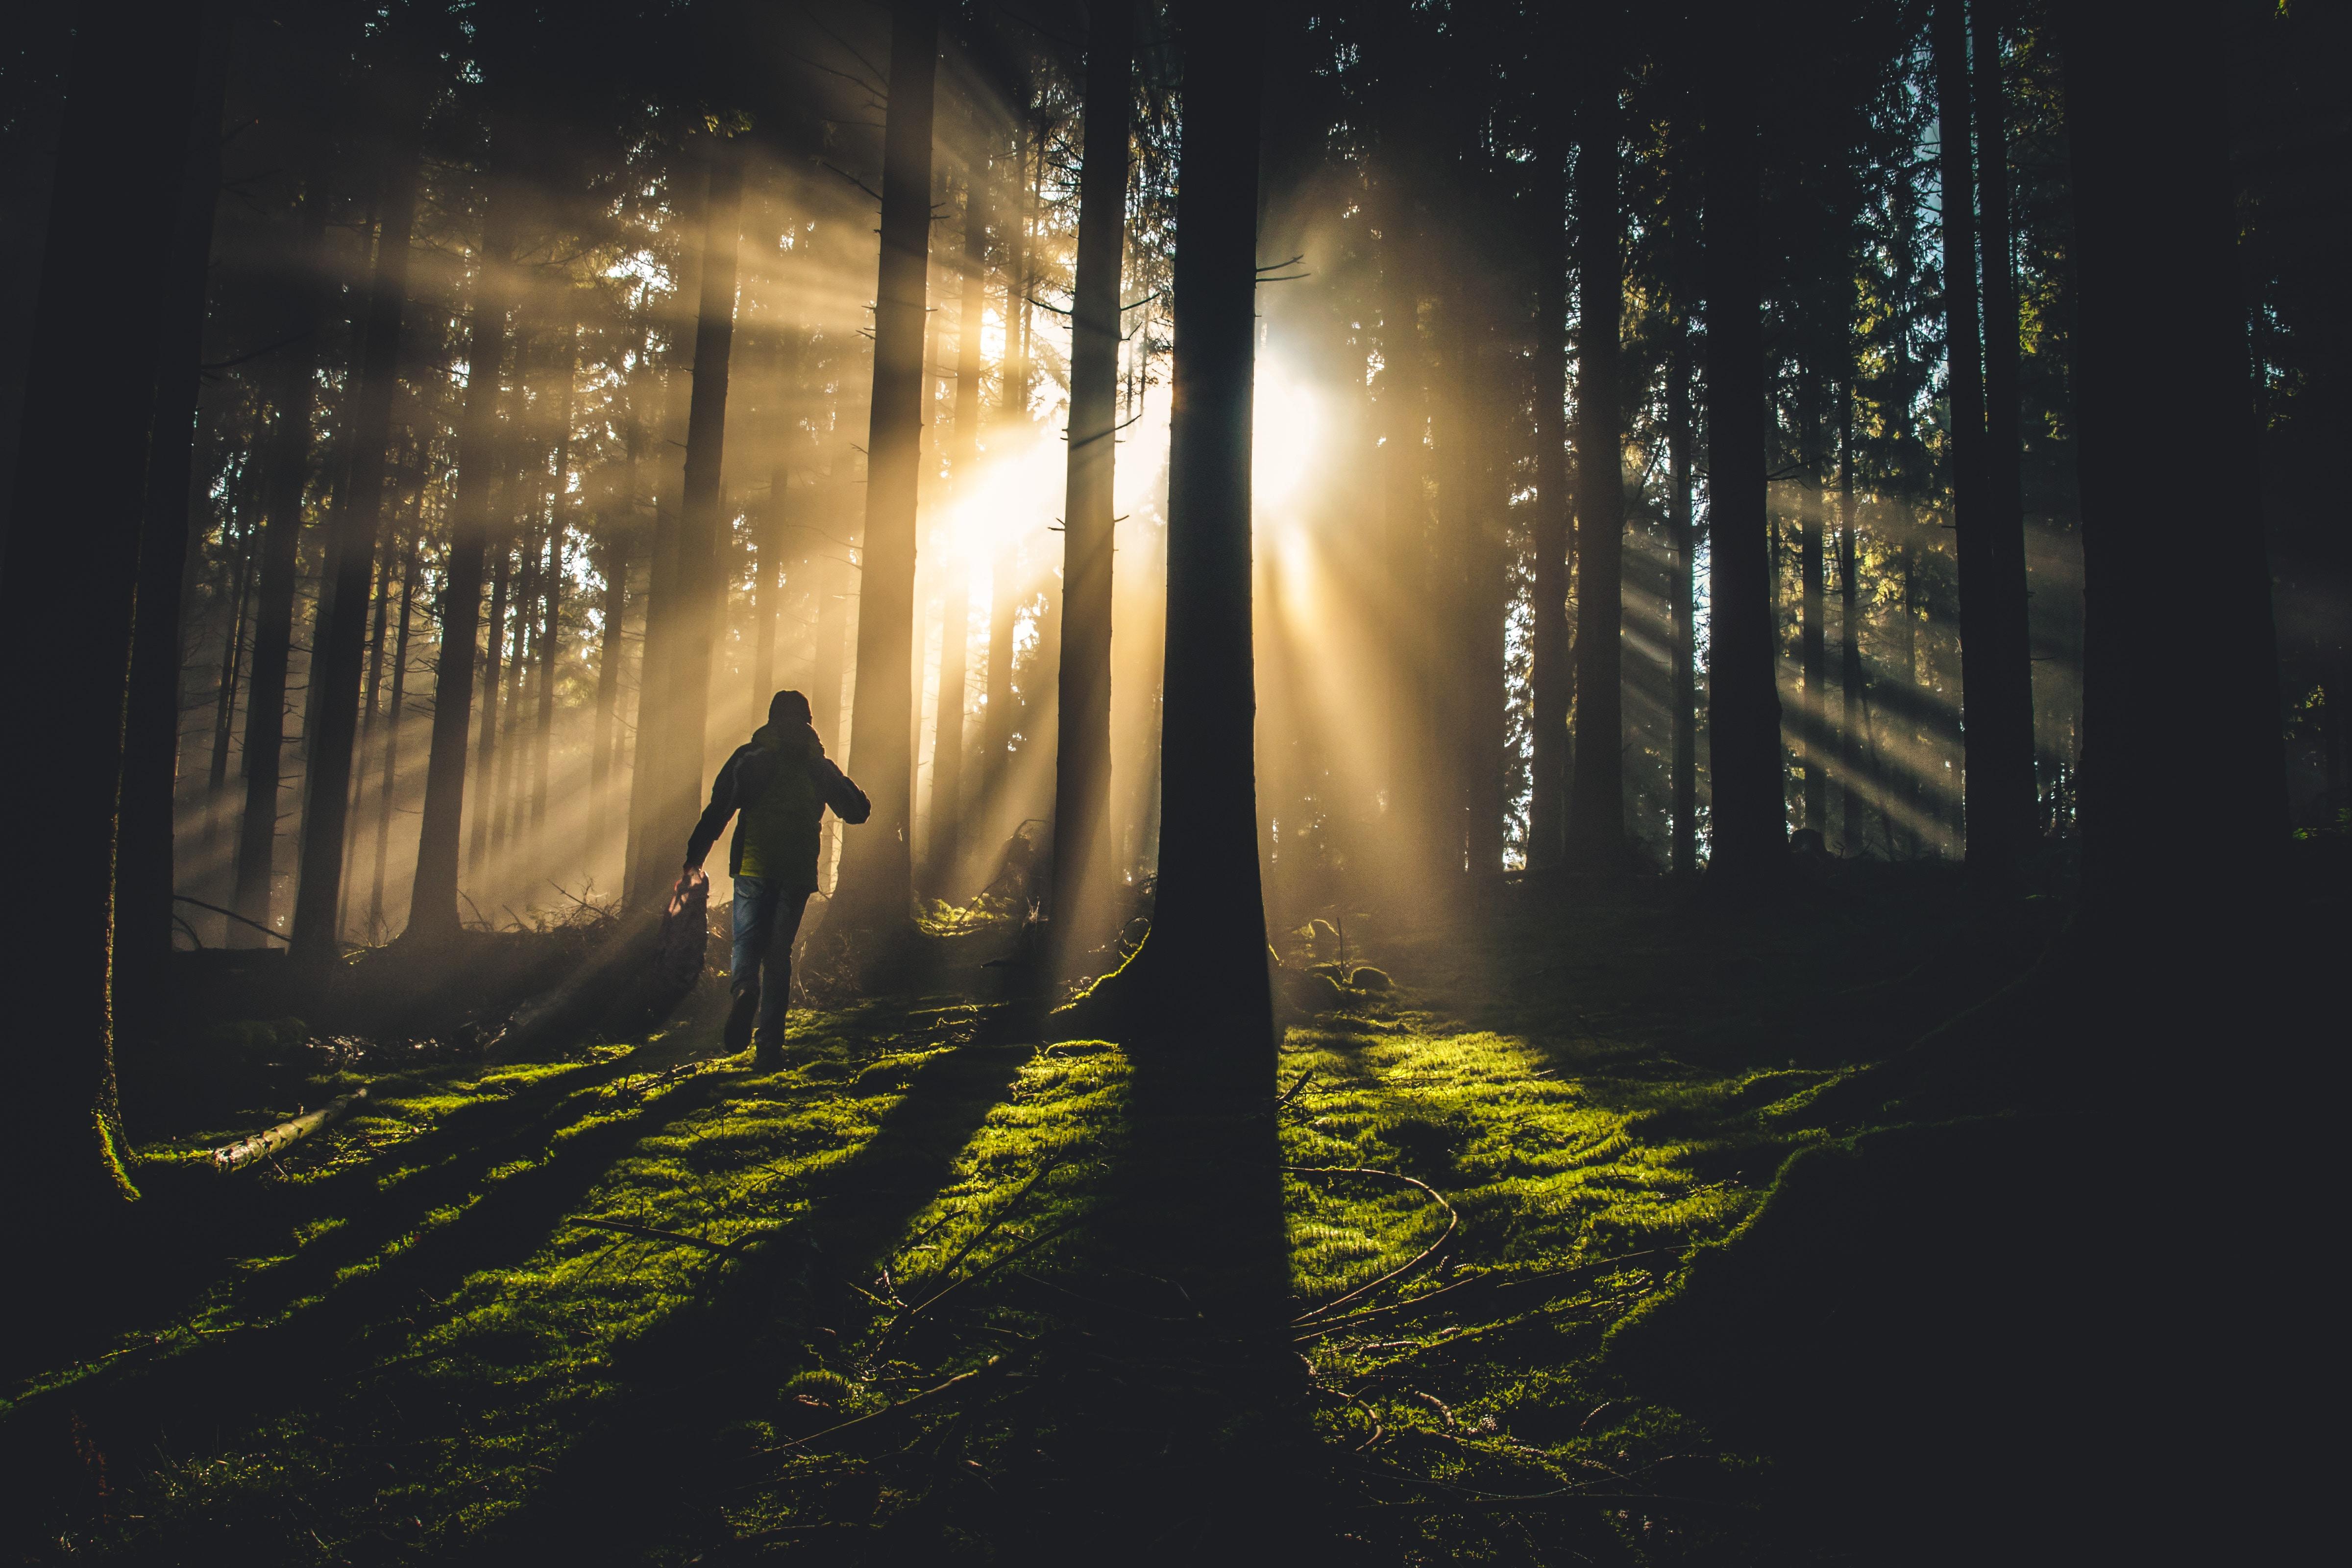 A man walking through the trees toward a sunset